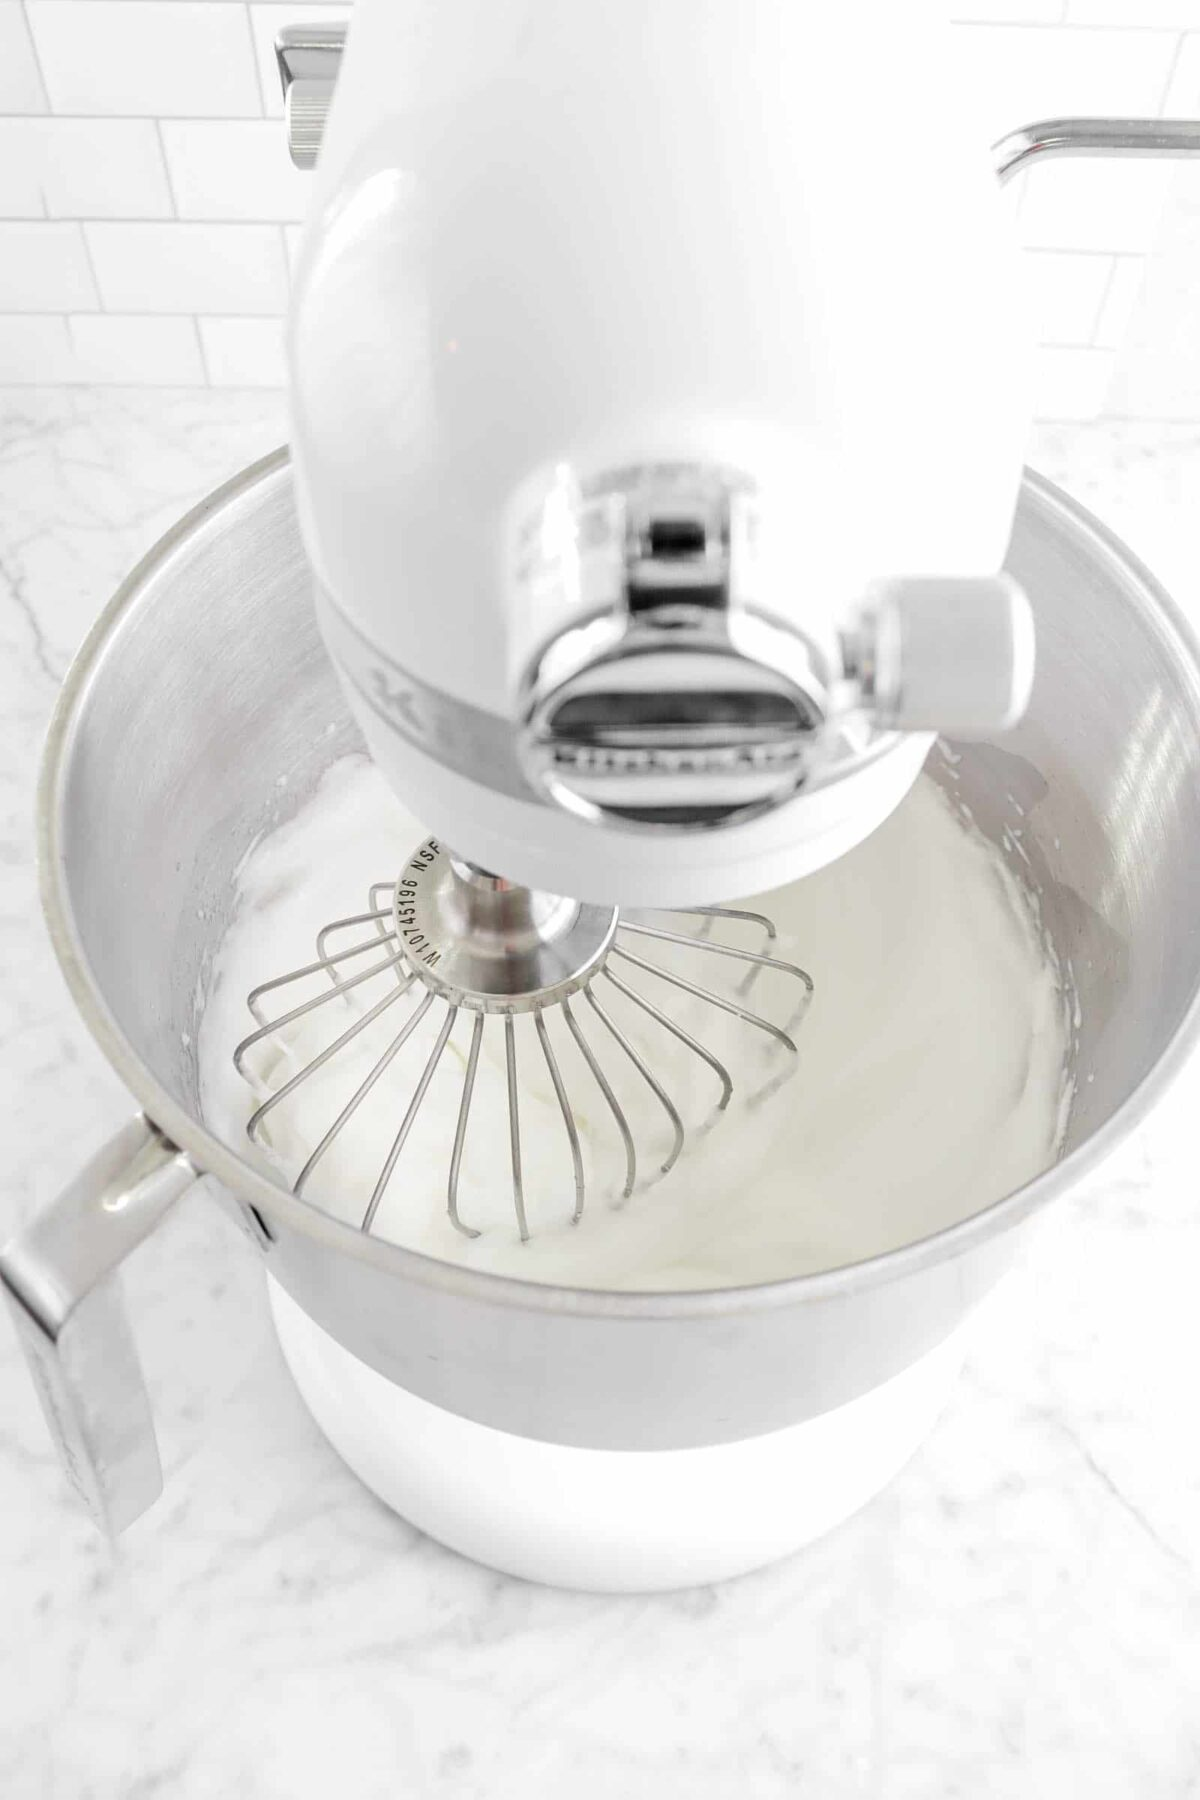 egg whites whipped in mixer